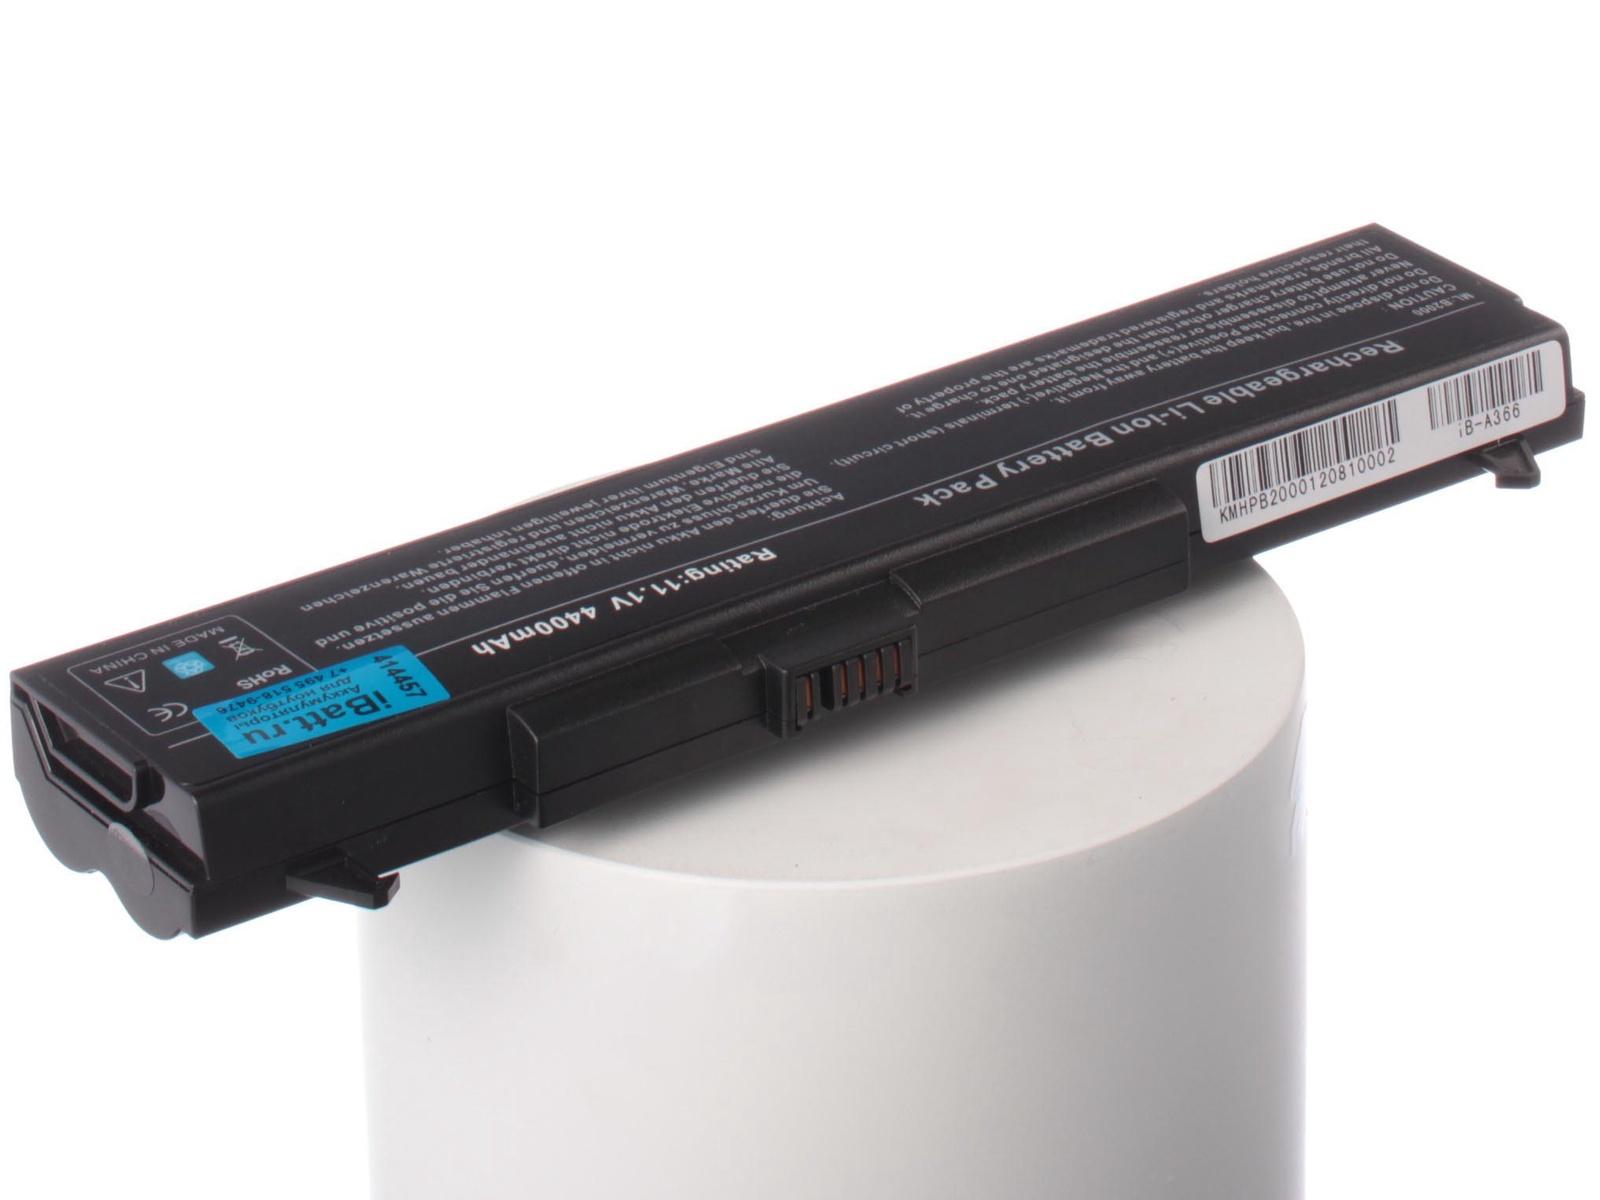 Аккумулятор для ноутбука iBatt для LG R405, LM50, LE50, LM40, LM60, LW40, P1 Express Dual, LW75, P1 Pro Express Dual, LS45, LW65 Express, S1 Express Dual, LS55 Express, LW40 Express, T1 Express Dual, LW60 Express, LW75 Express sky express авиакомпания